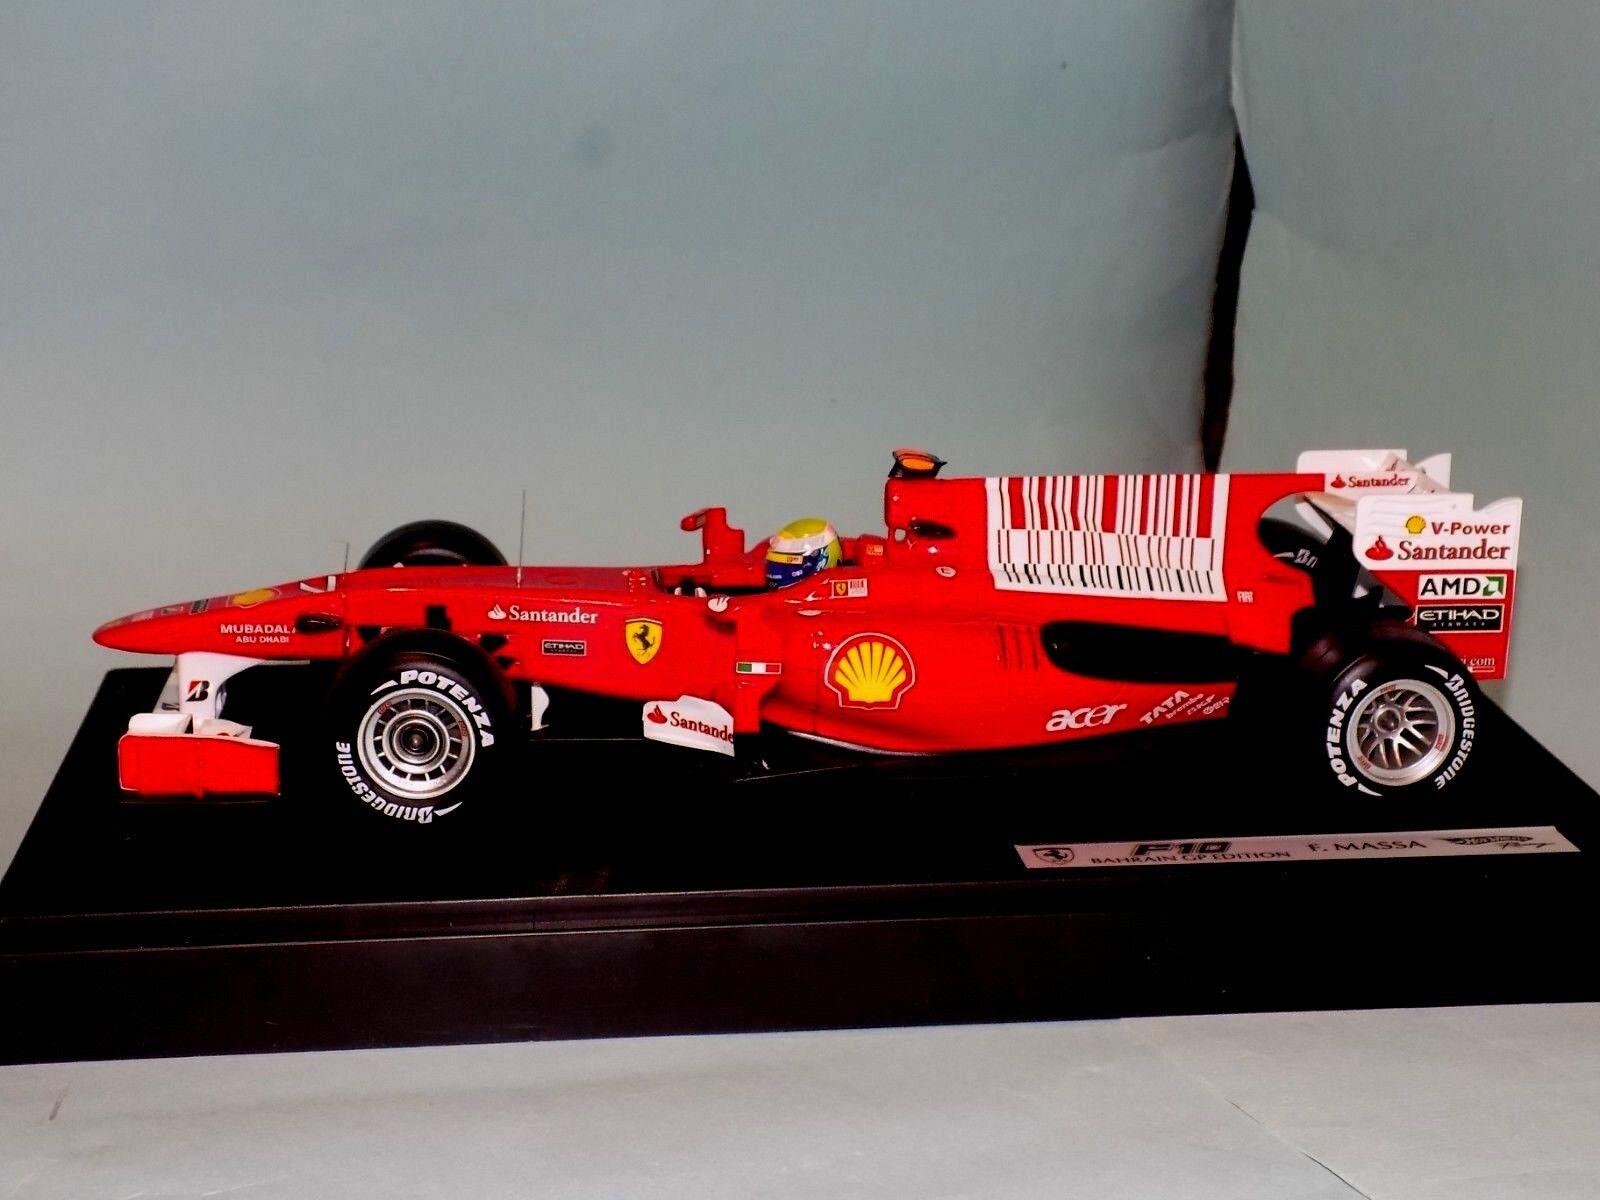 Ferrari F10 Bahrein GP Edition 2010  7 Felipe Massa Rojo Elite T6288 1 18